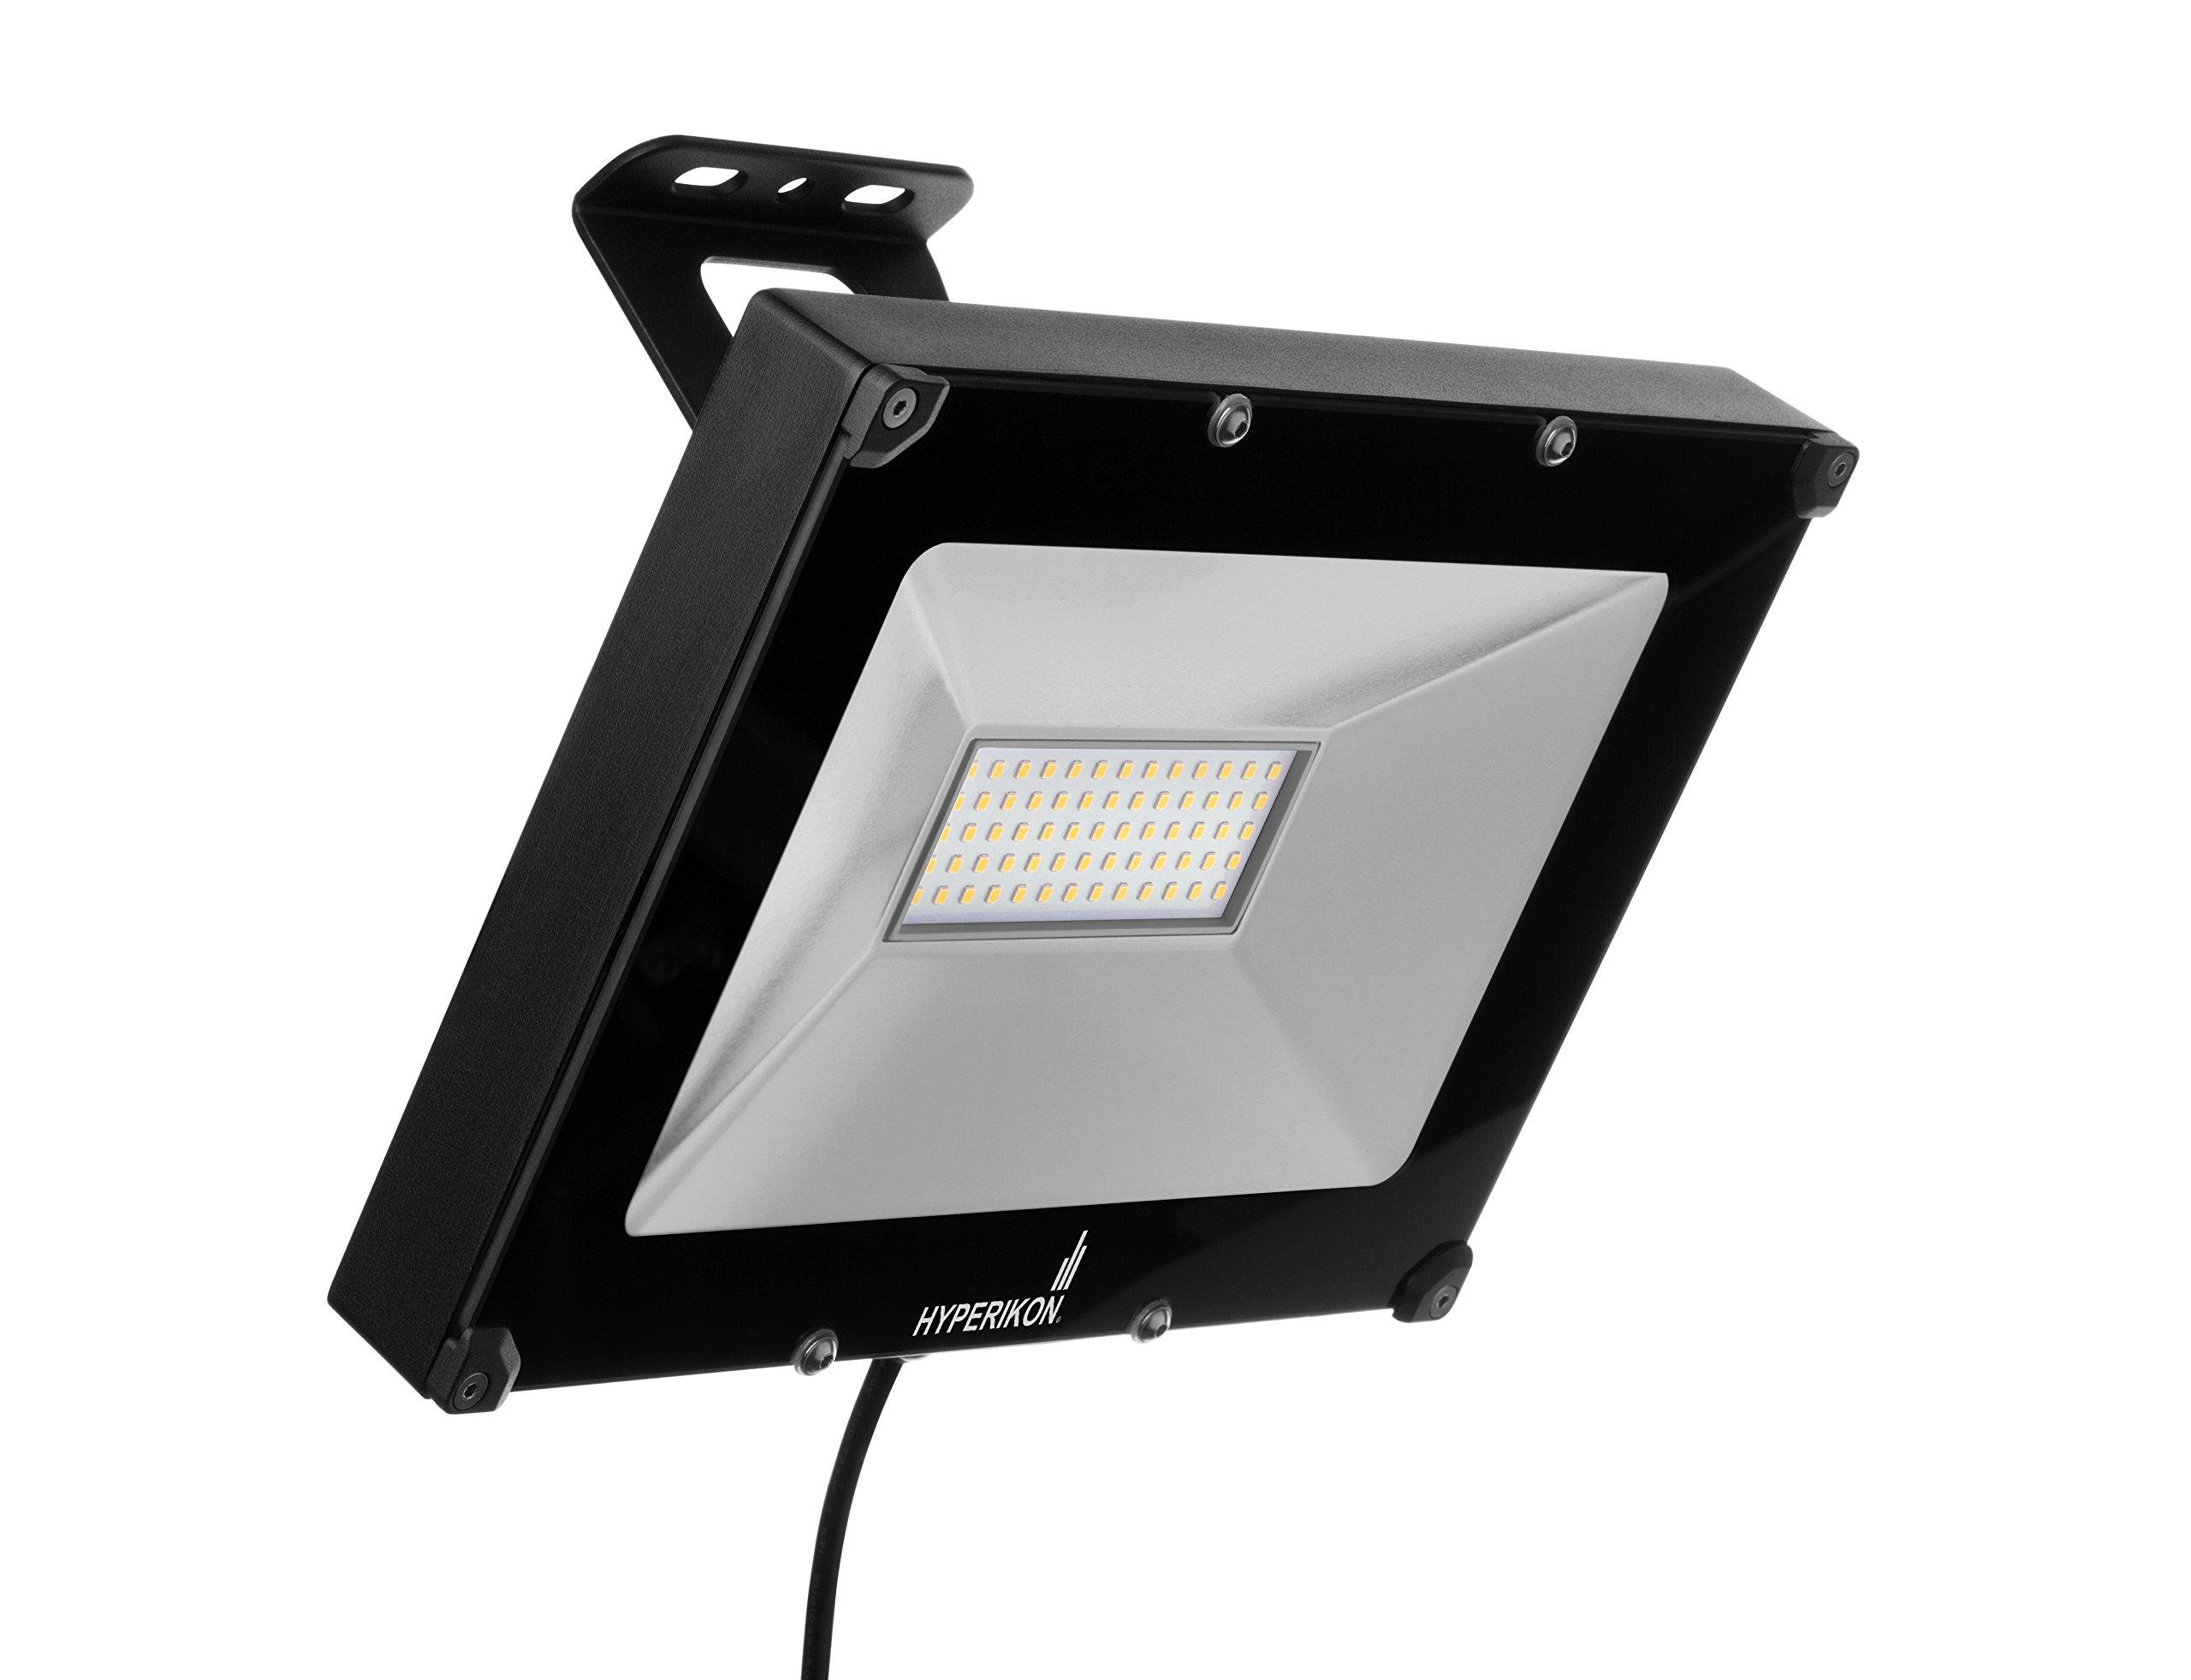 Hyperikon LED Flood Light, 50W (200W Equivalent), 4000 Lumen, 5000K (Crystal White Glow), Waterproof, IP65, 120-277v, UL-Listed